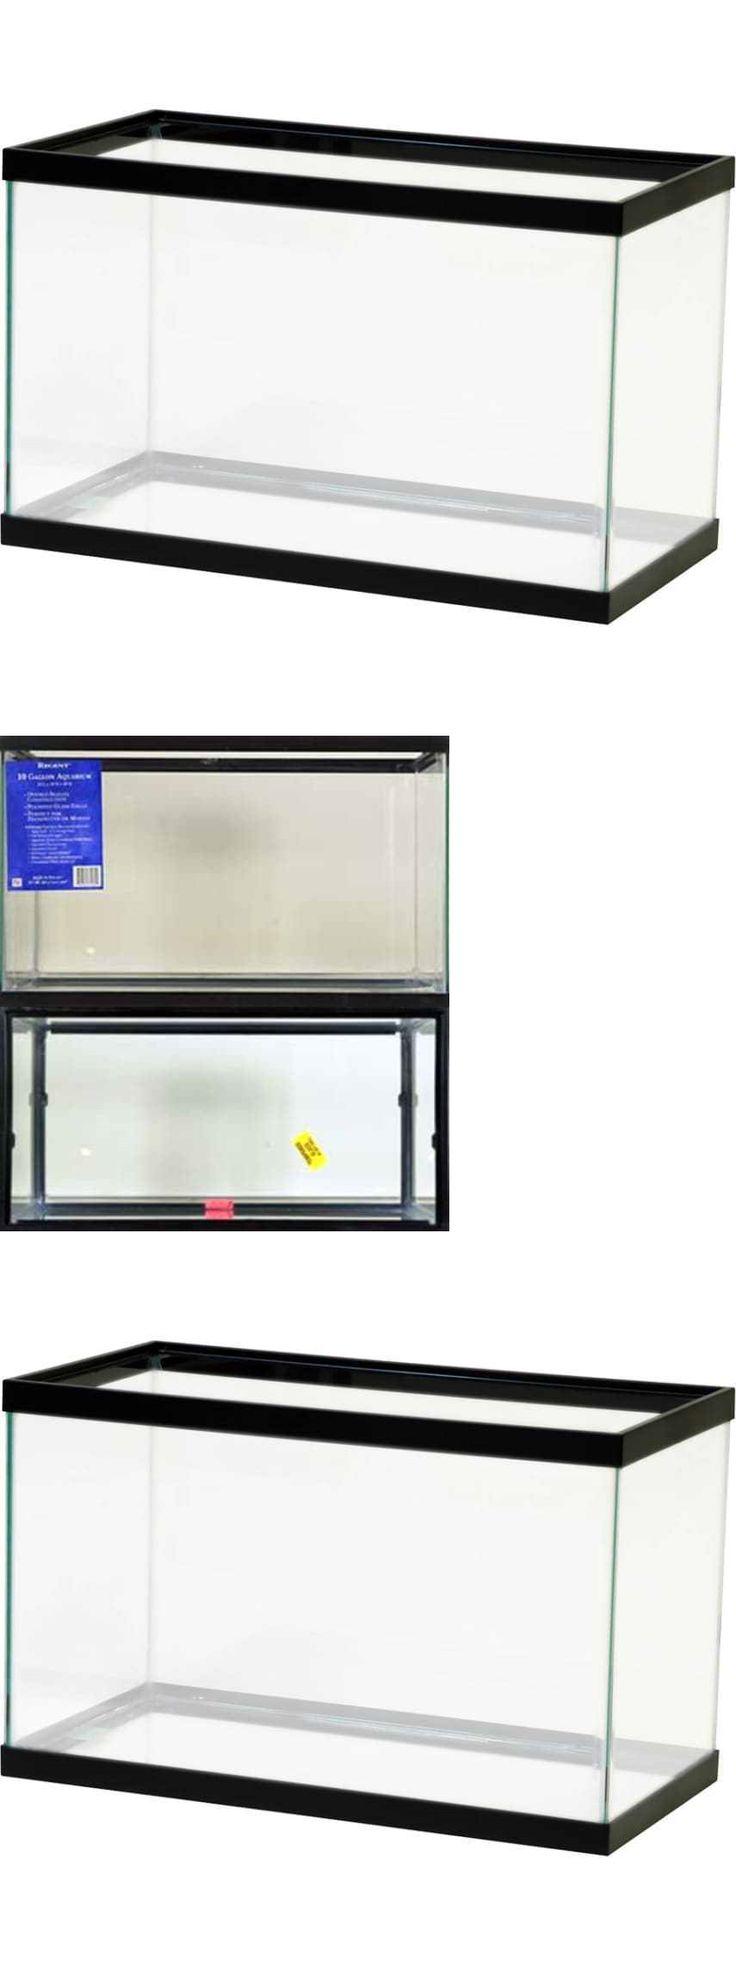 Pumps Air 100351: New Quality Aqua Culture 10 Gallon Water Aquarium Fish Reptiles Tank Free Ship -> BUY IT NOW ONLY: $30.3 on eBay!